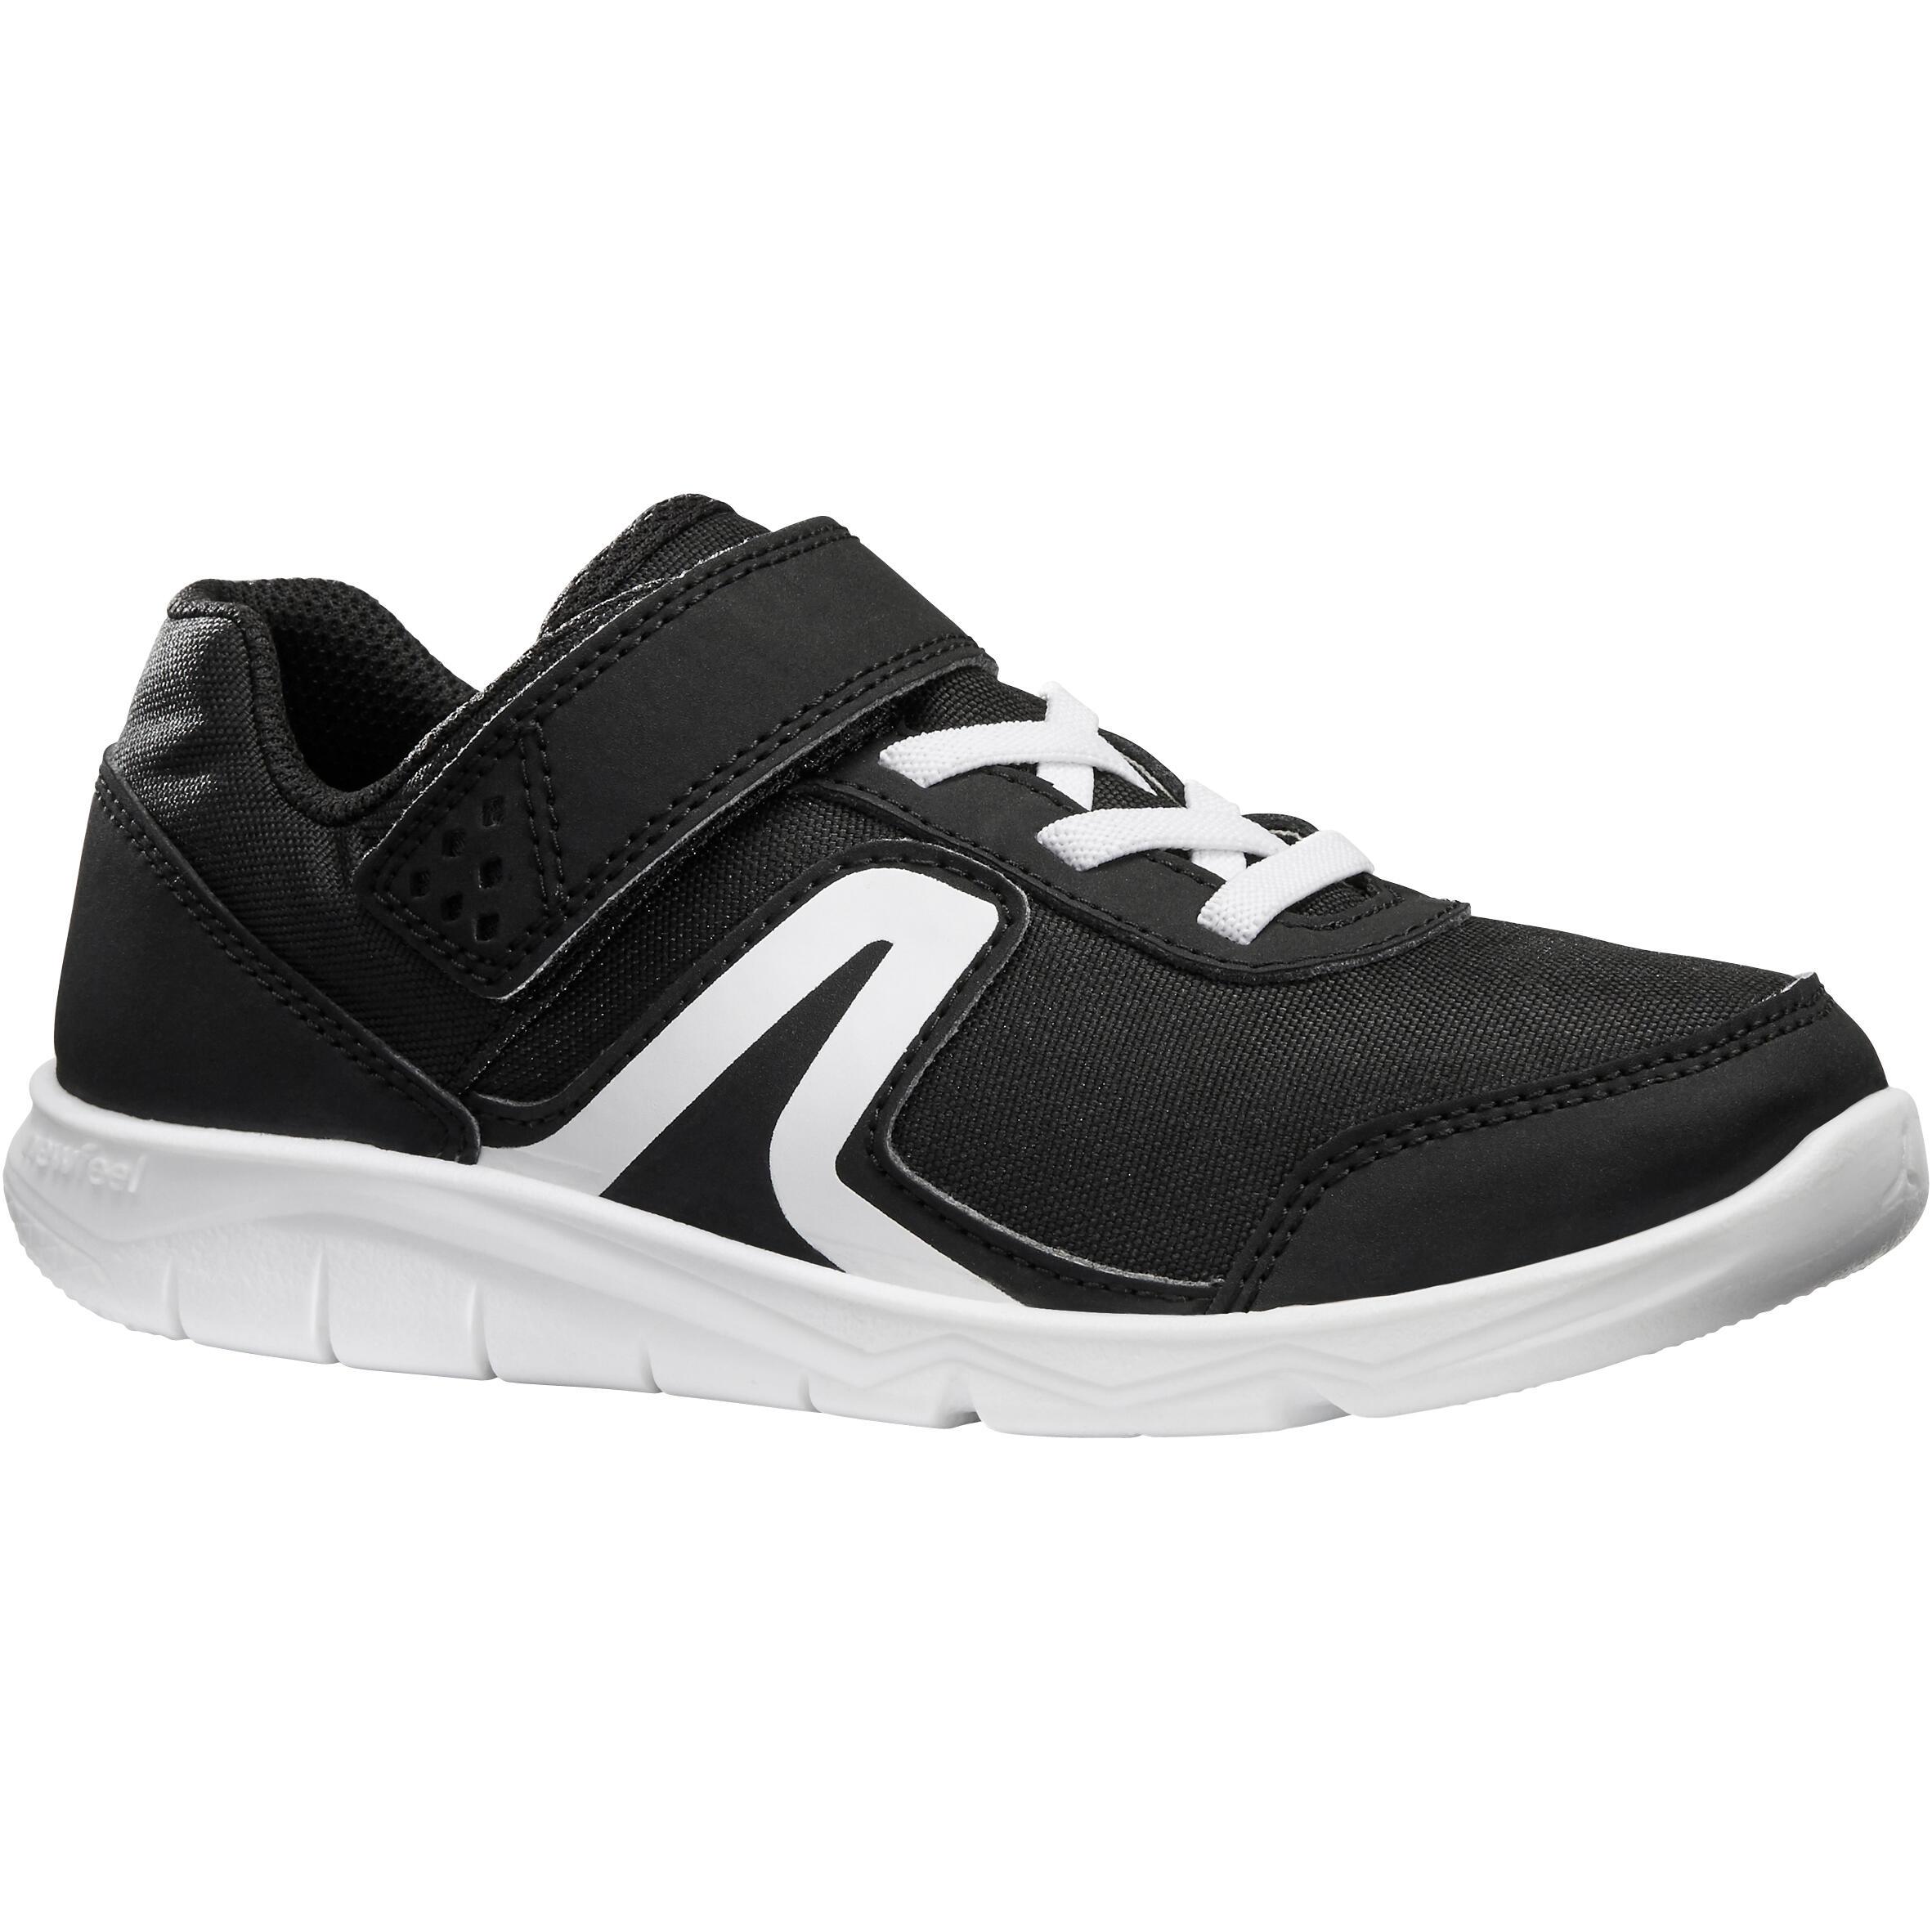 Tenis de caminata deportiva para niños PW 100 negro / blanco